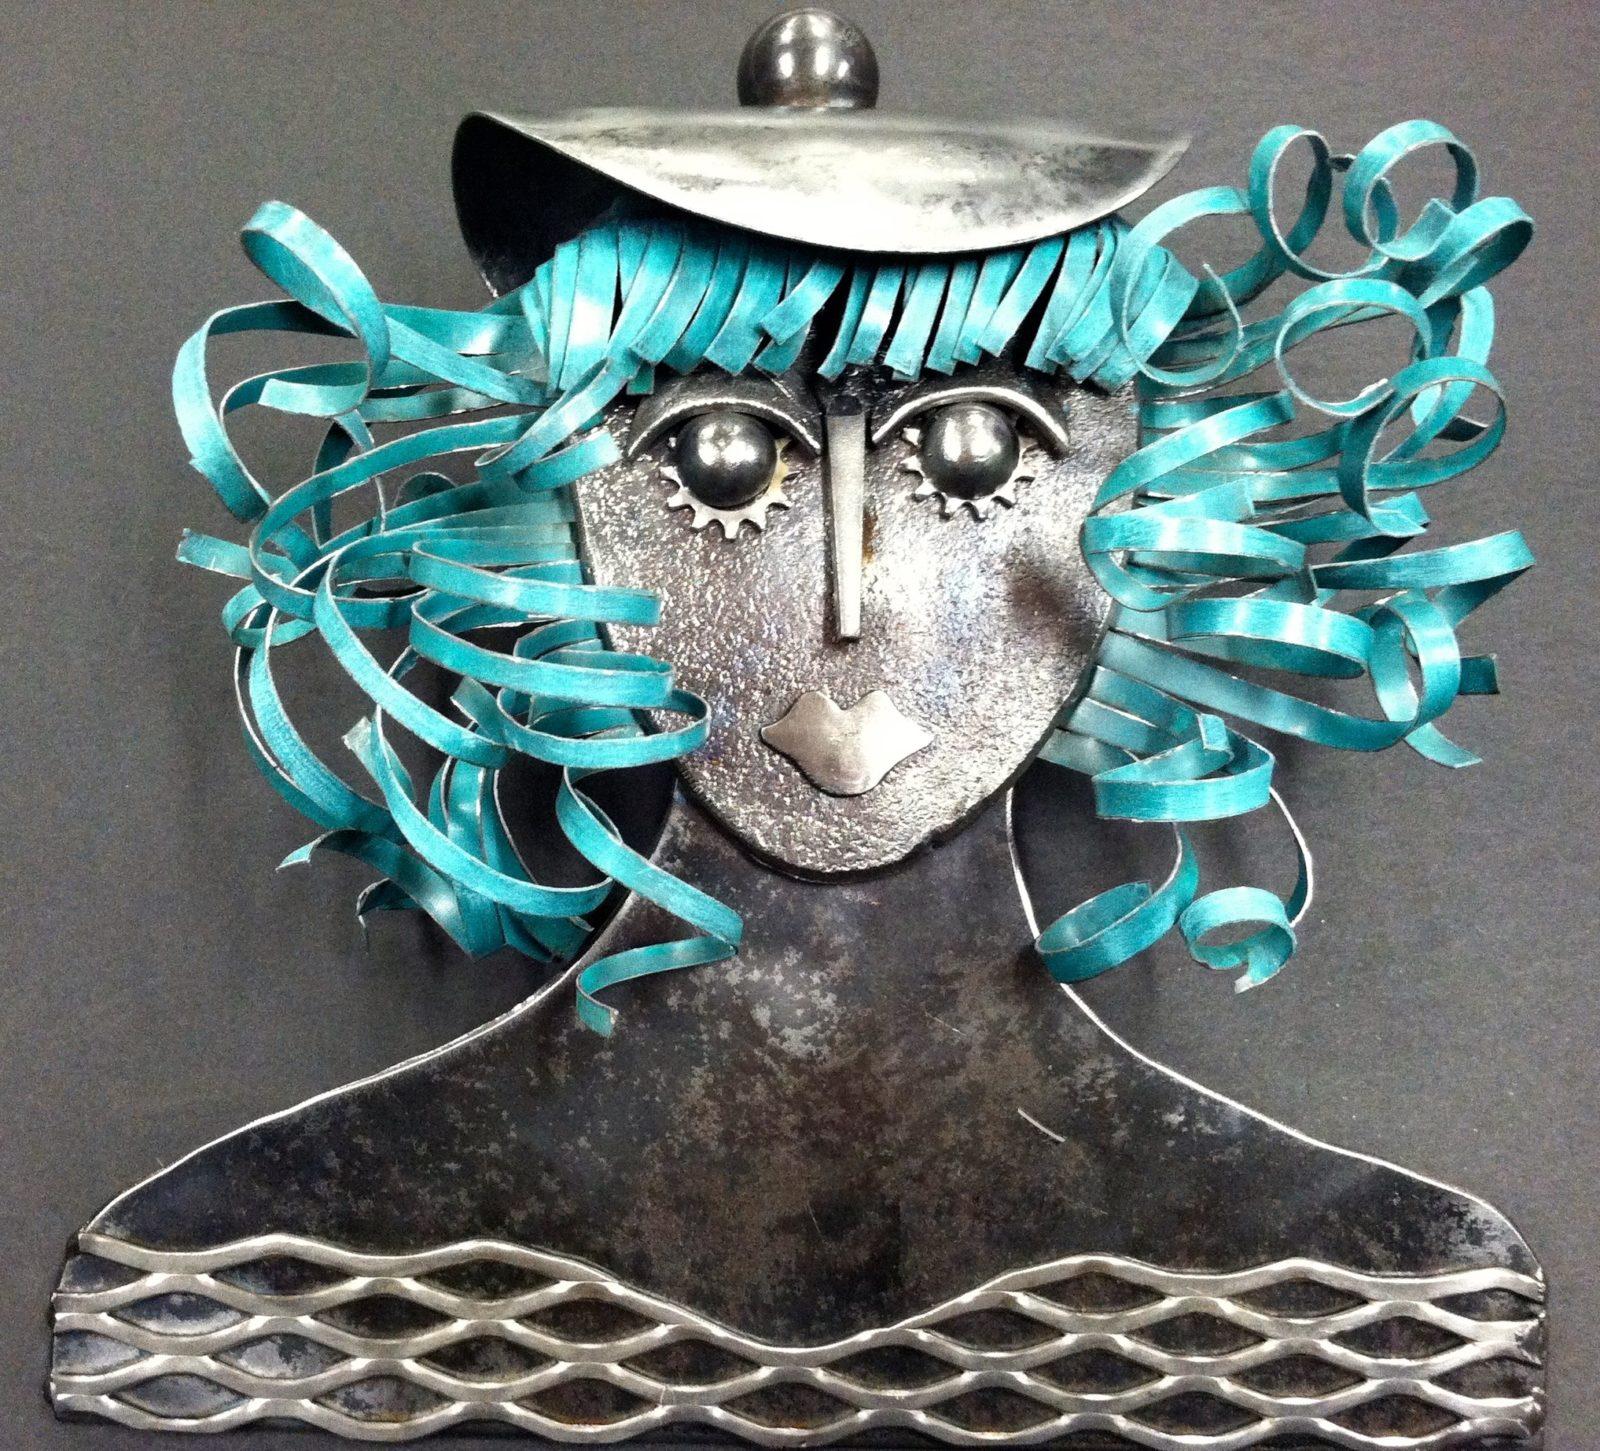 Bridgette Sculpture of a woman with blue hair